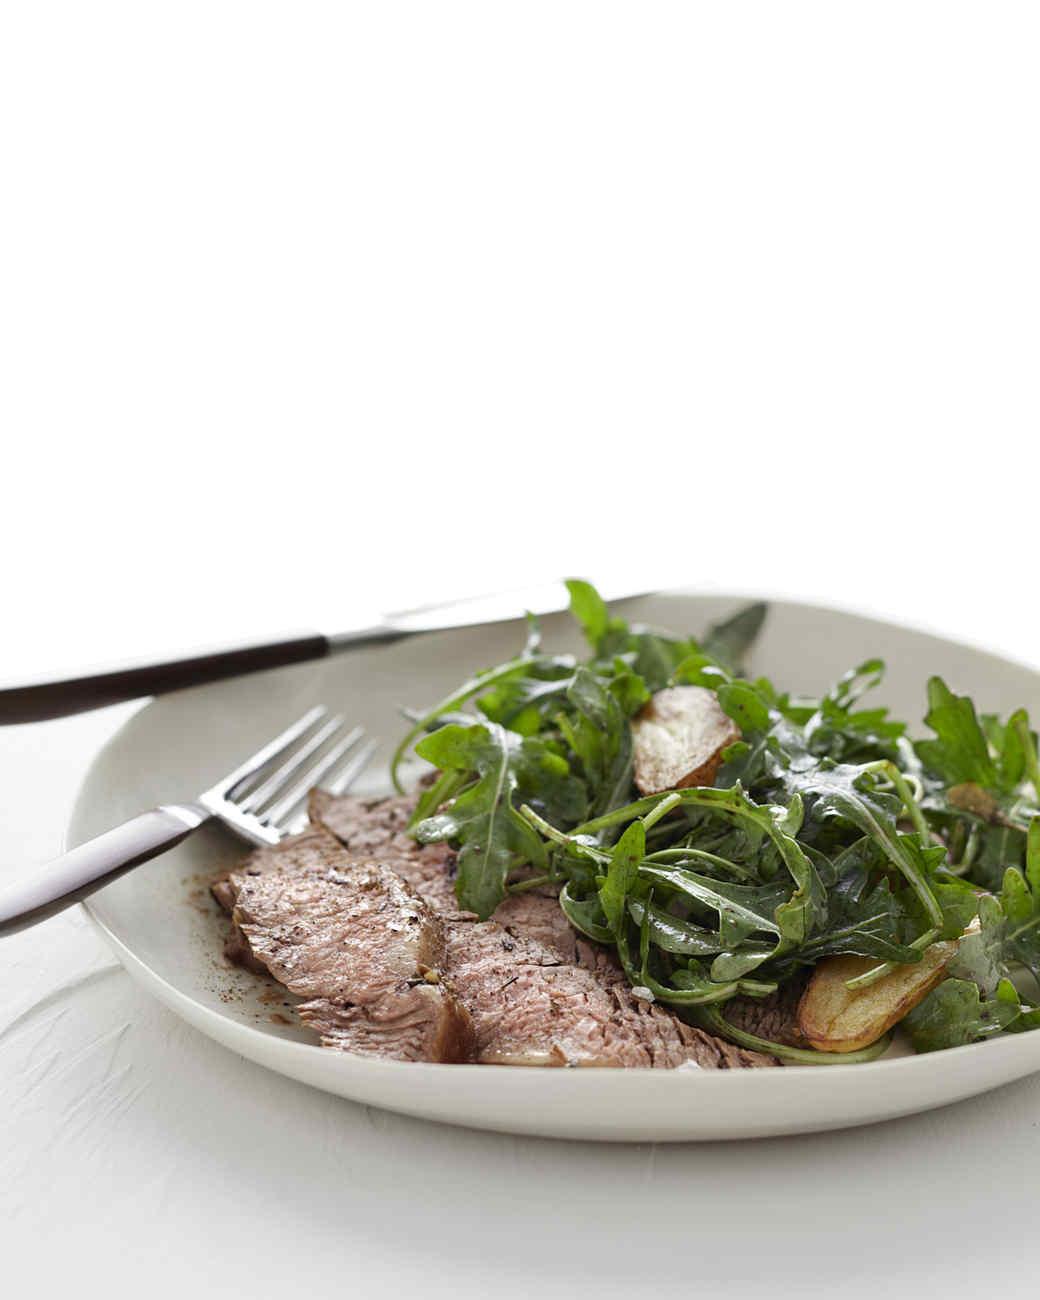 herbed-steak-arugula-potatoes-med107616.jpg